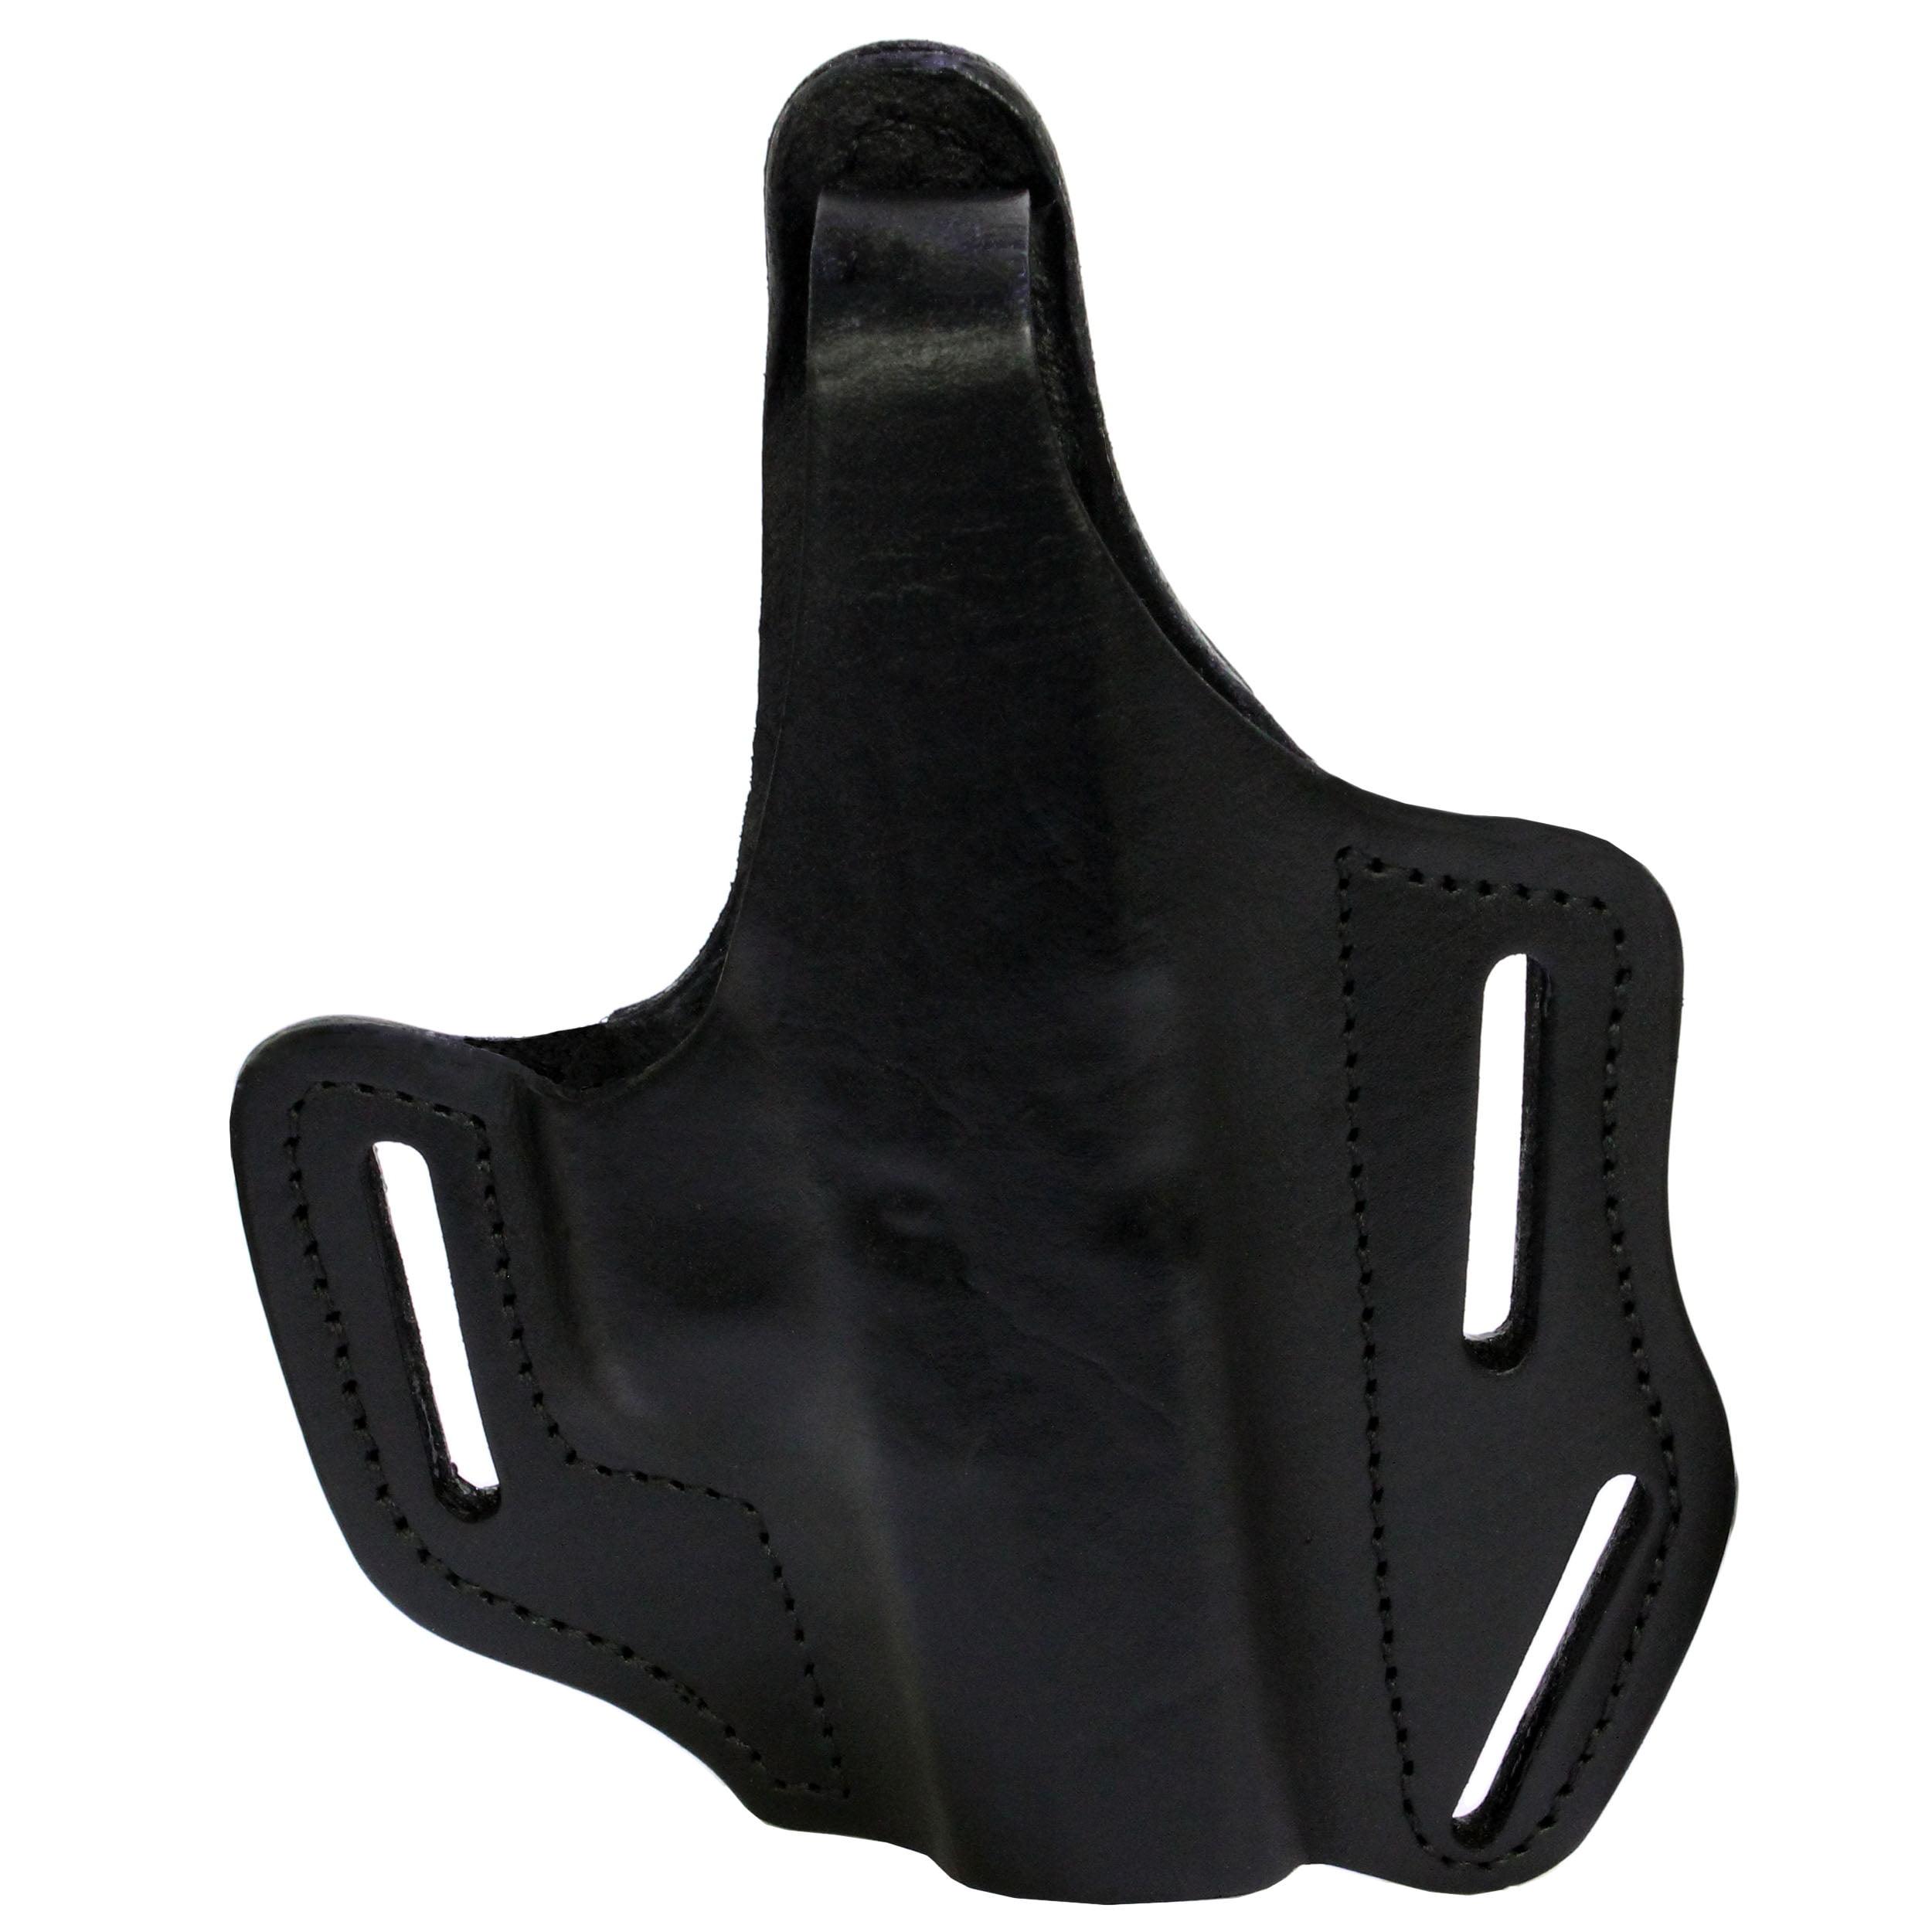 Frontline Multi Purpose Pancake Leather Holster Glock 30, Black, Right Hand